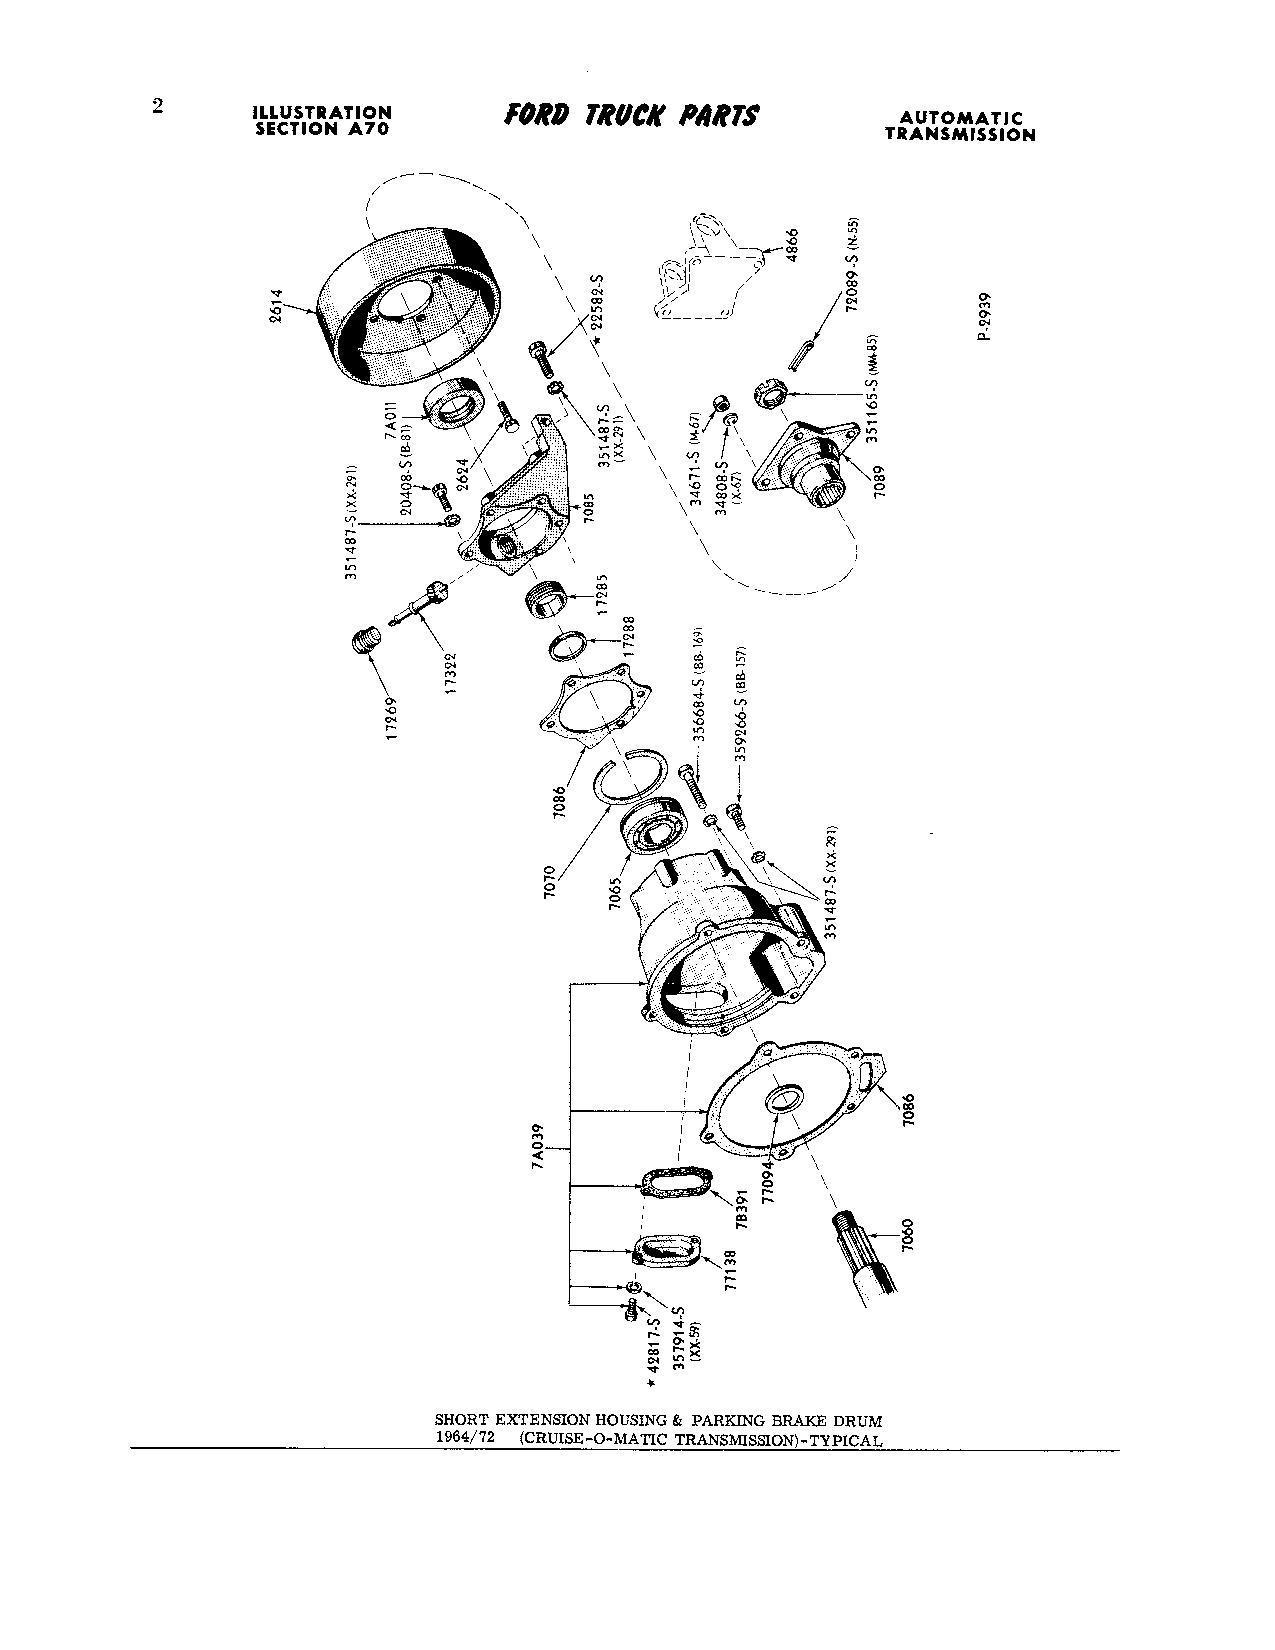 1961 f100 wiring diagram database 2003 F150 Radio Wiring Diagram 1961 ford f100 unibody wiring diagram database 1961 ford f100 grill 1961 f100